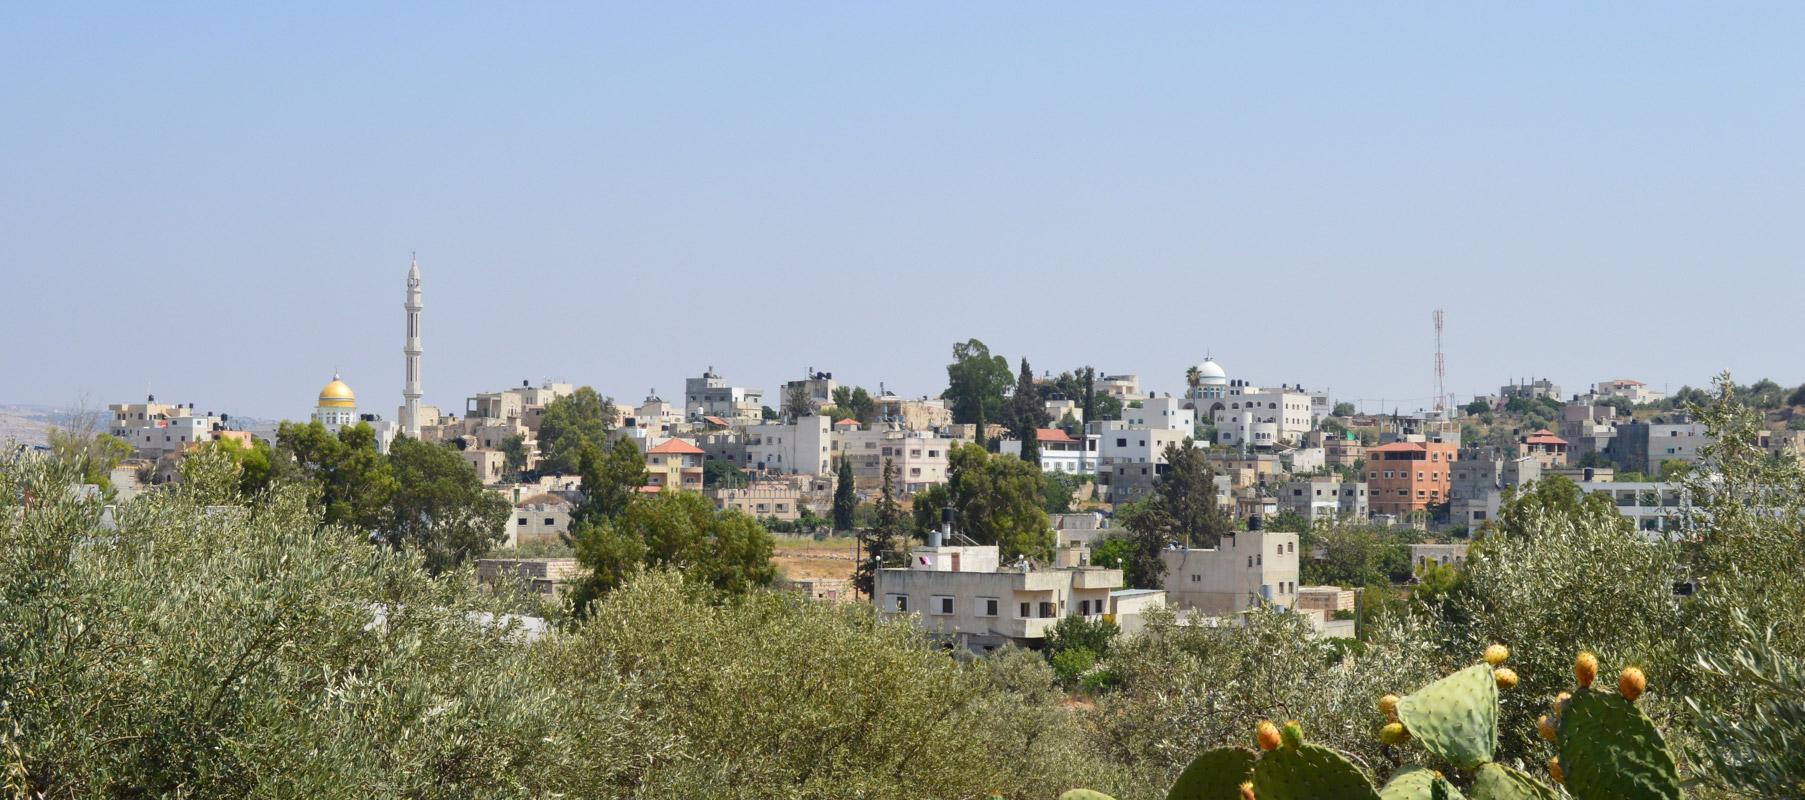 Rantis, Palestine